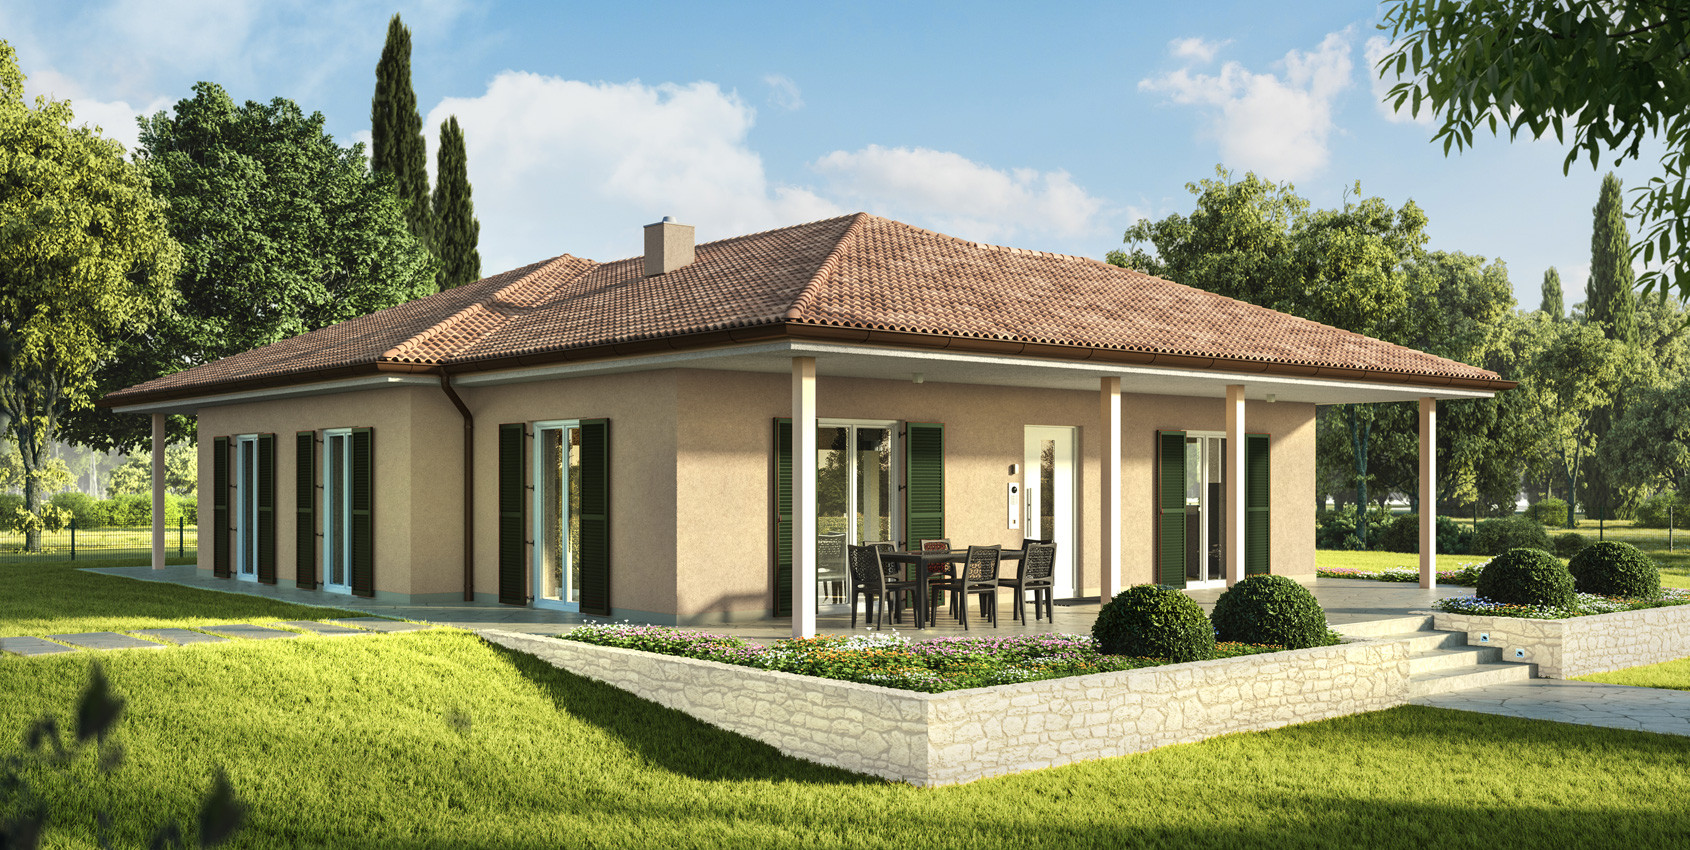 Casa In Legno In Stile Classic Carima Wolf Haus